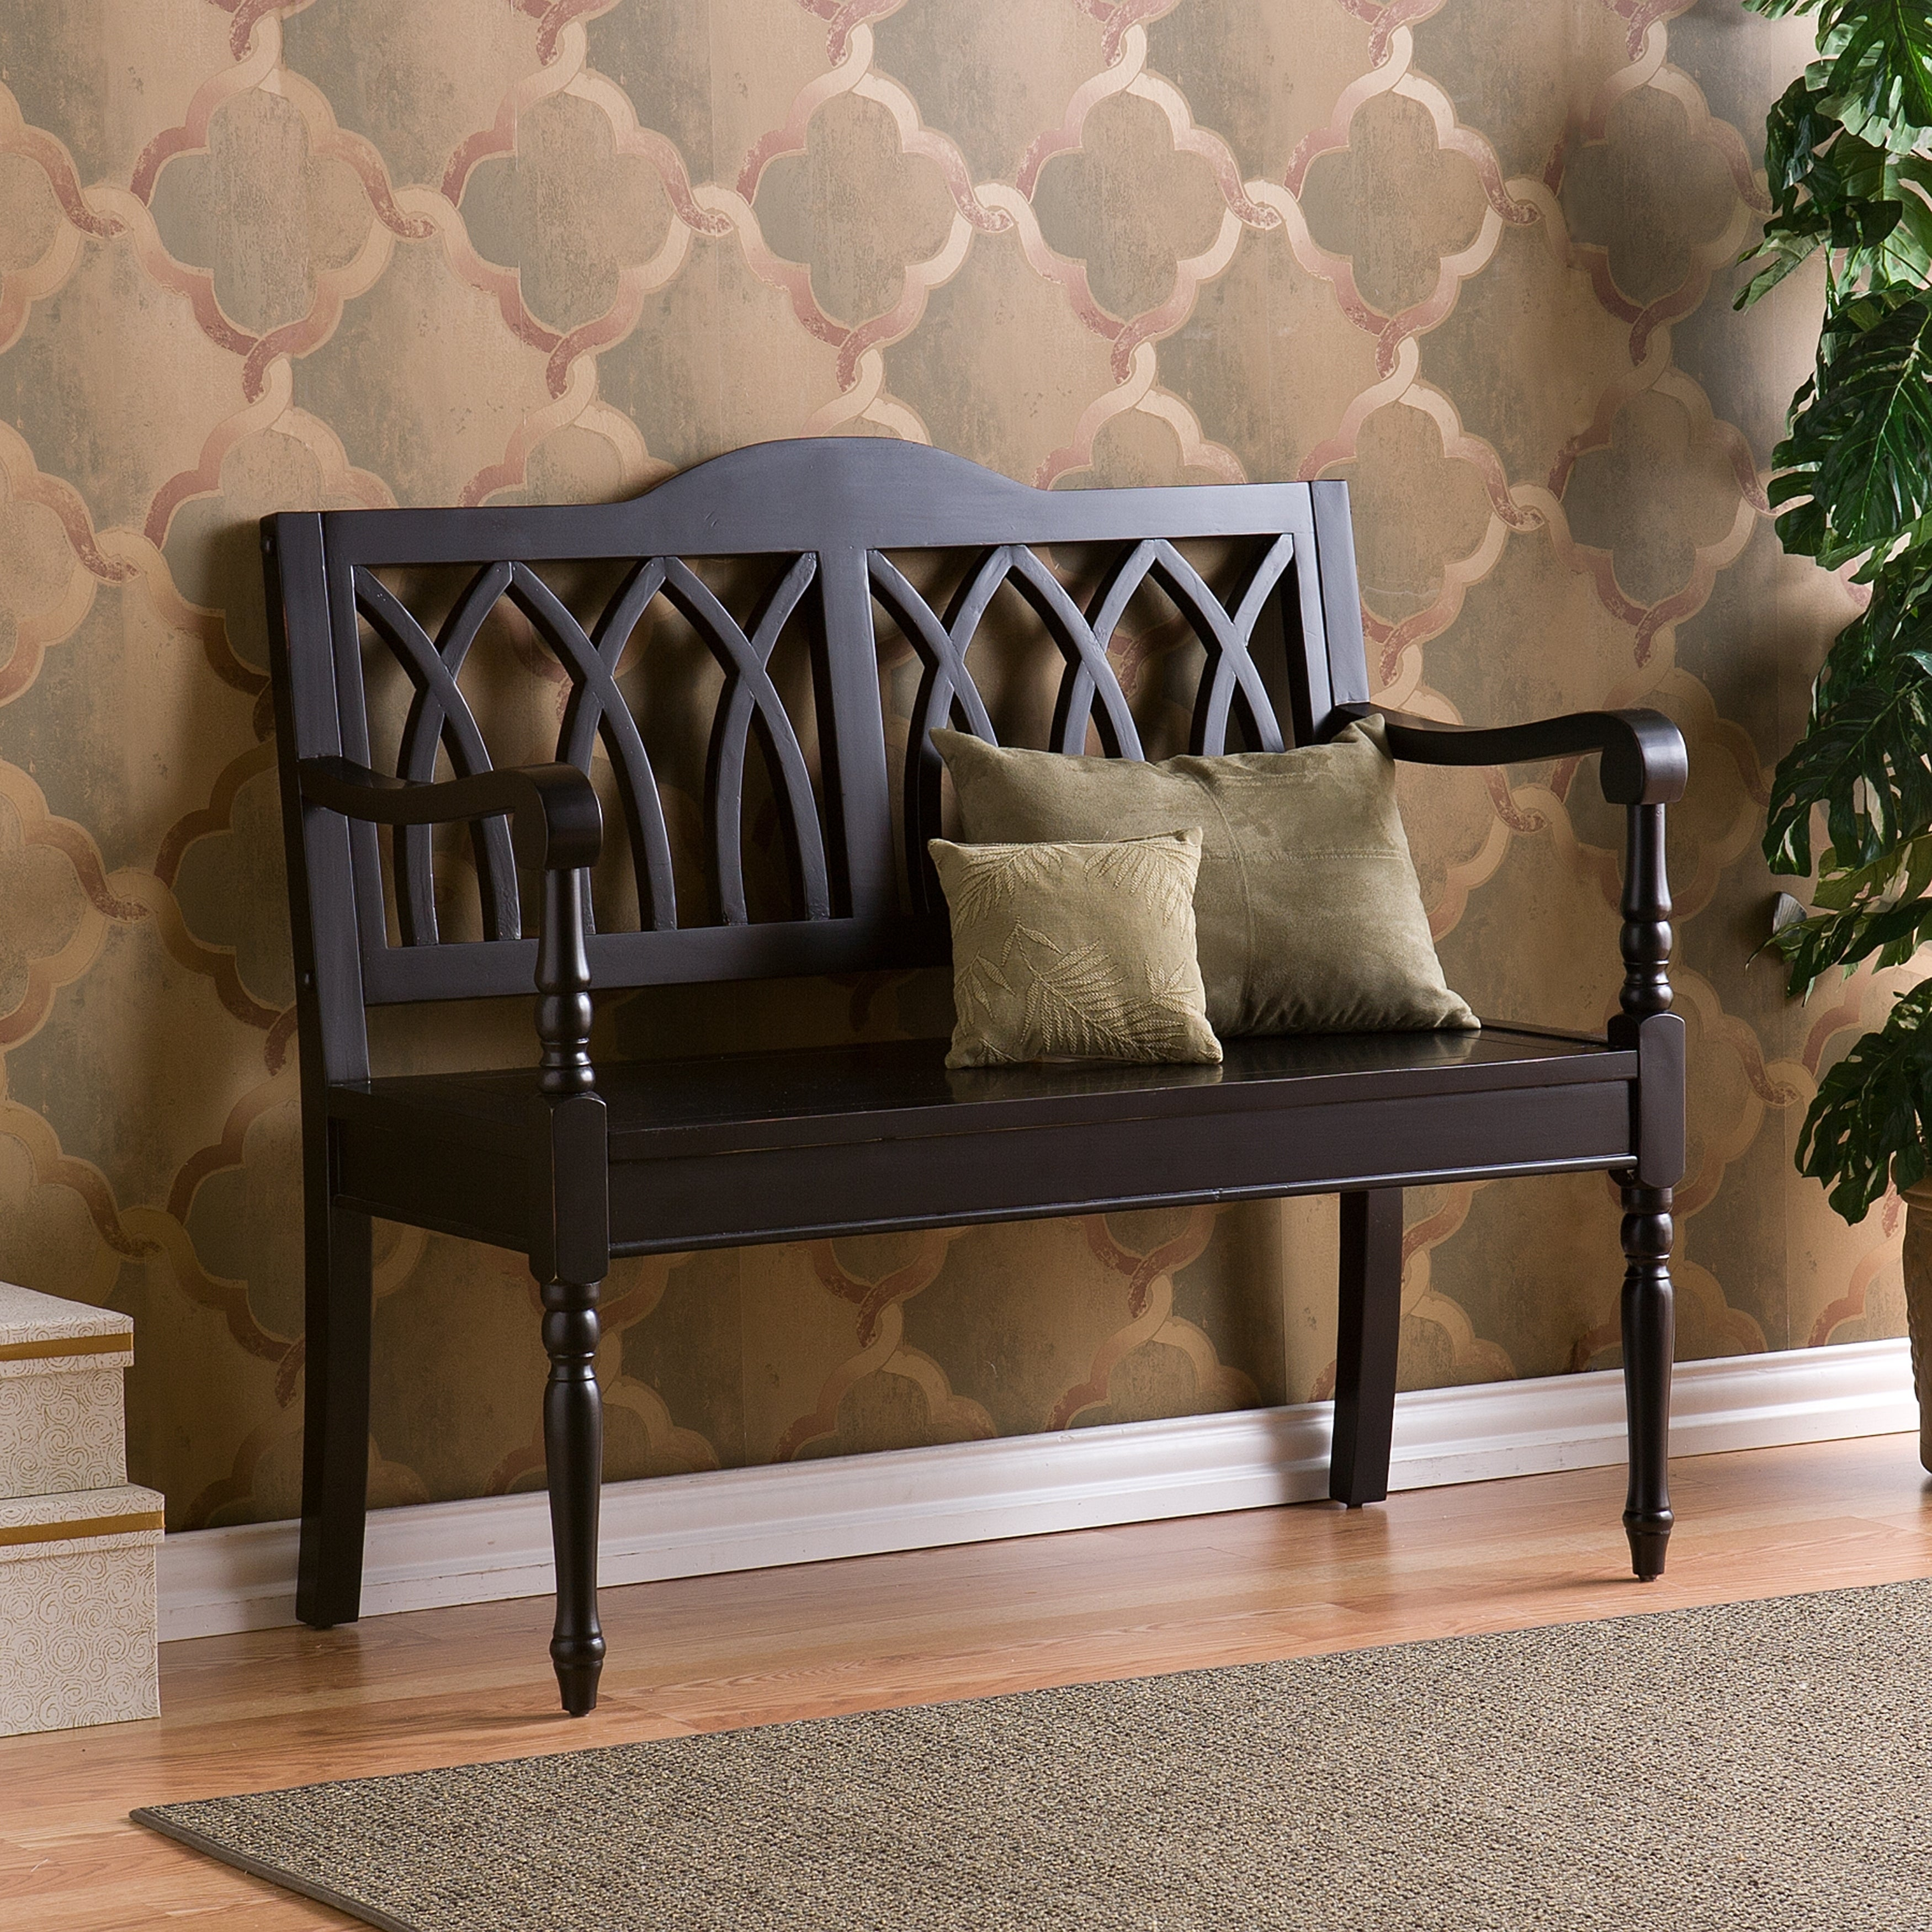 Details About Wood Bench Seat Indoor Entryway Hallway Bedroom Accent Furniture Antique Black